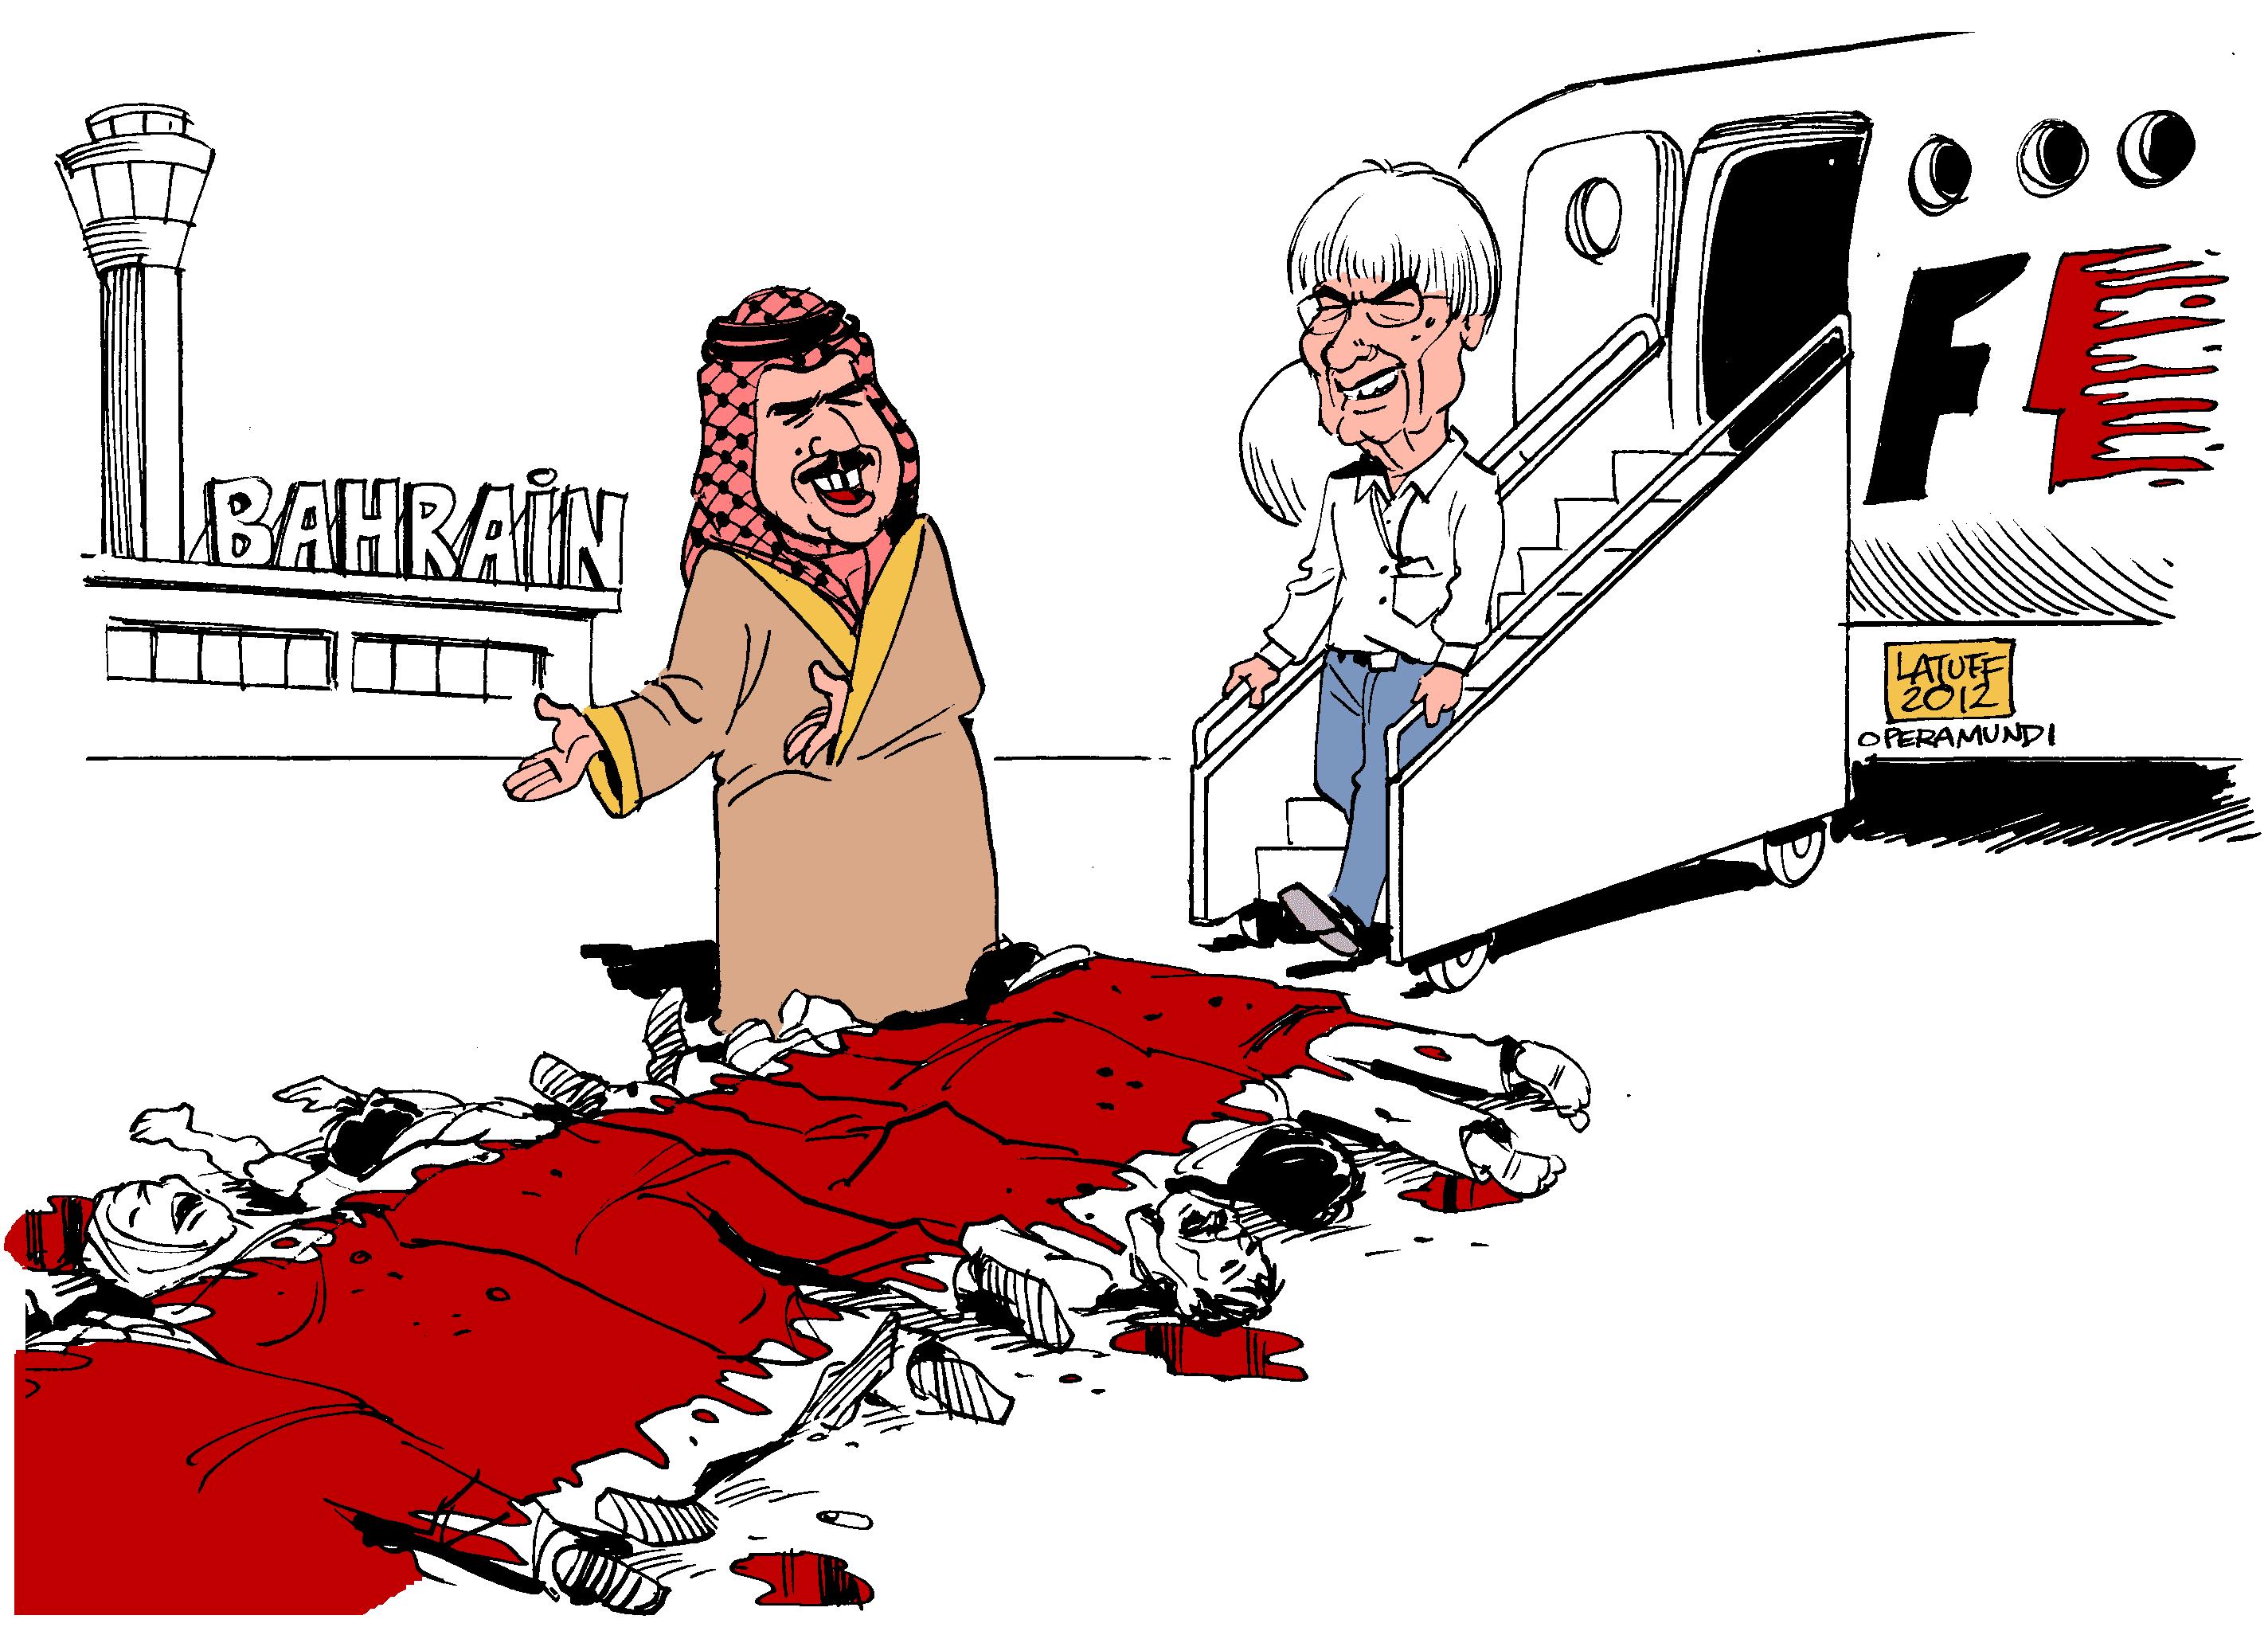 Берни Экклстоун прибывает в Бахрейн - карикатура Carlos Latuff на тему Гран-при Бахрейна 2012